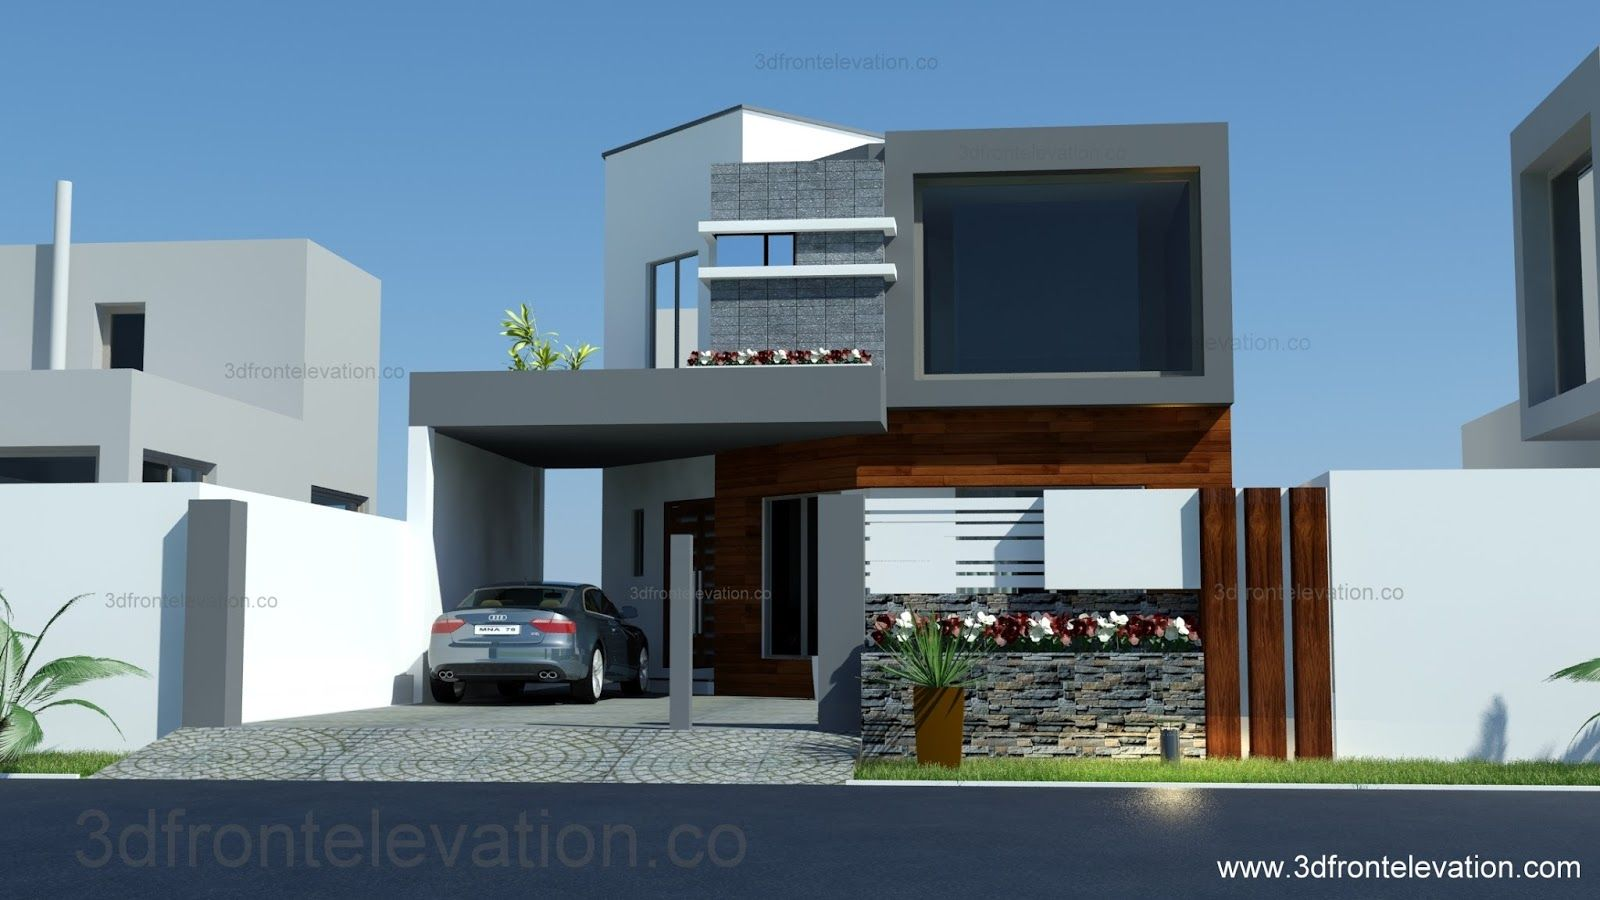 8 Marla House Plan Layout Elevation Fachadas Pinterest